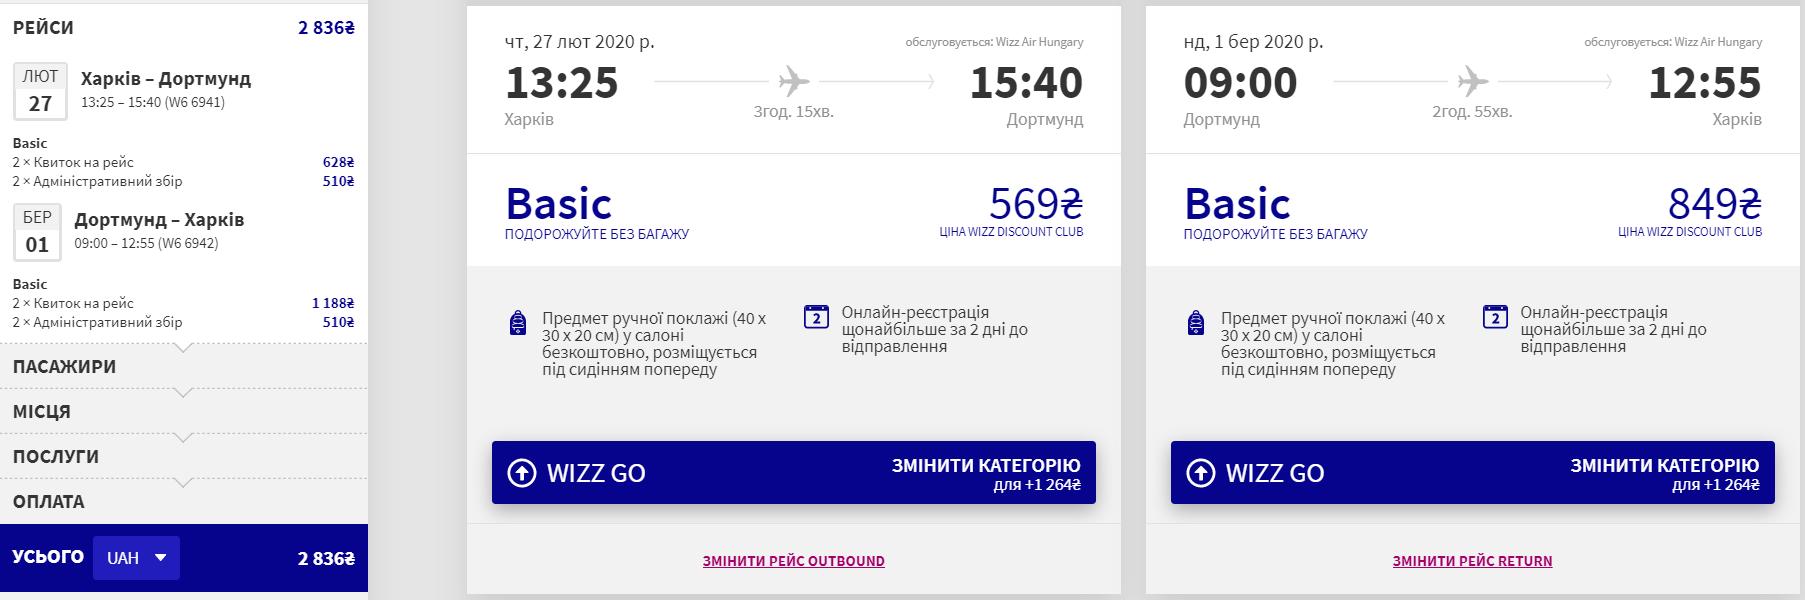 Харків - Дортмунд - Харків >>